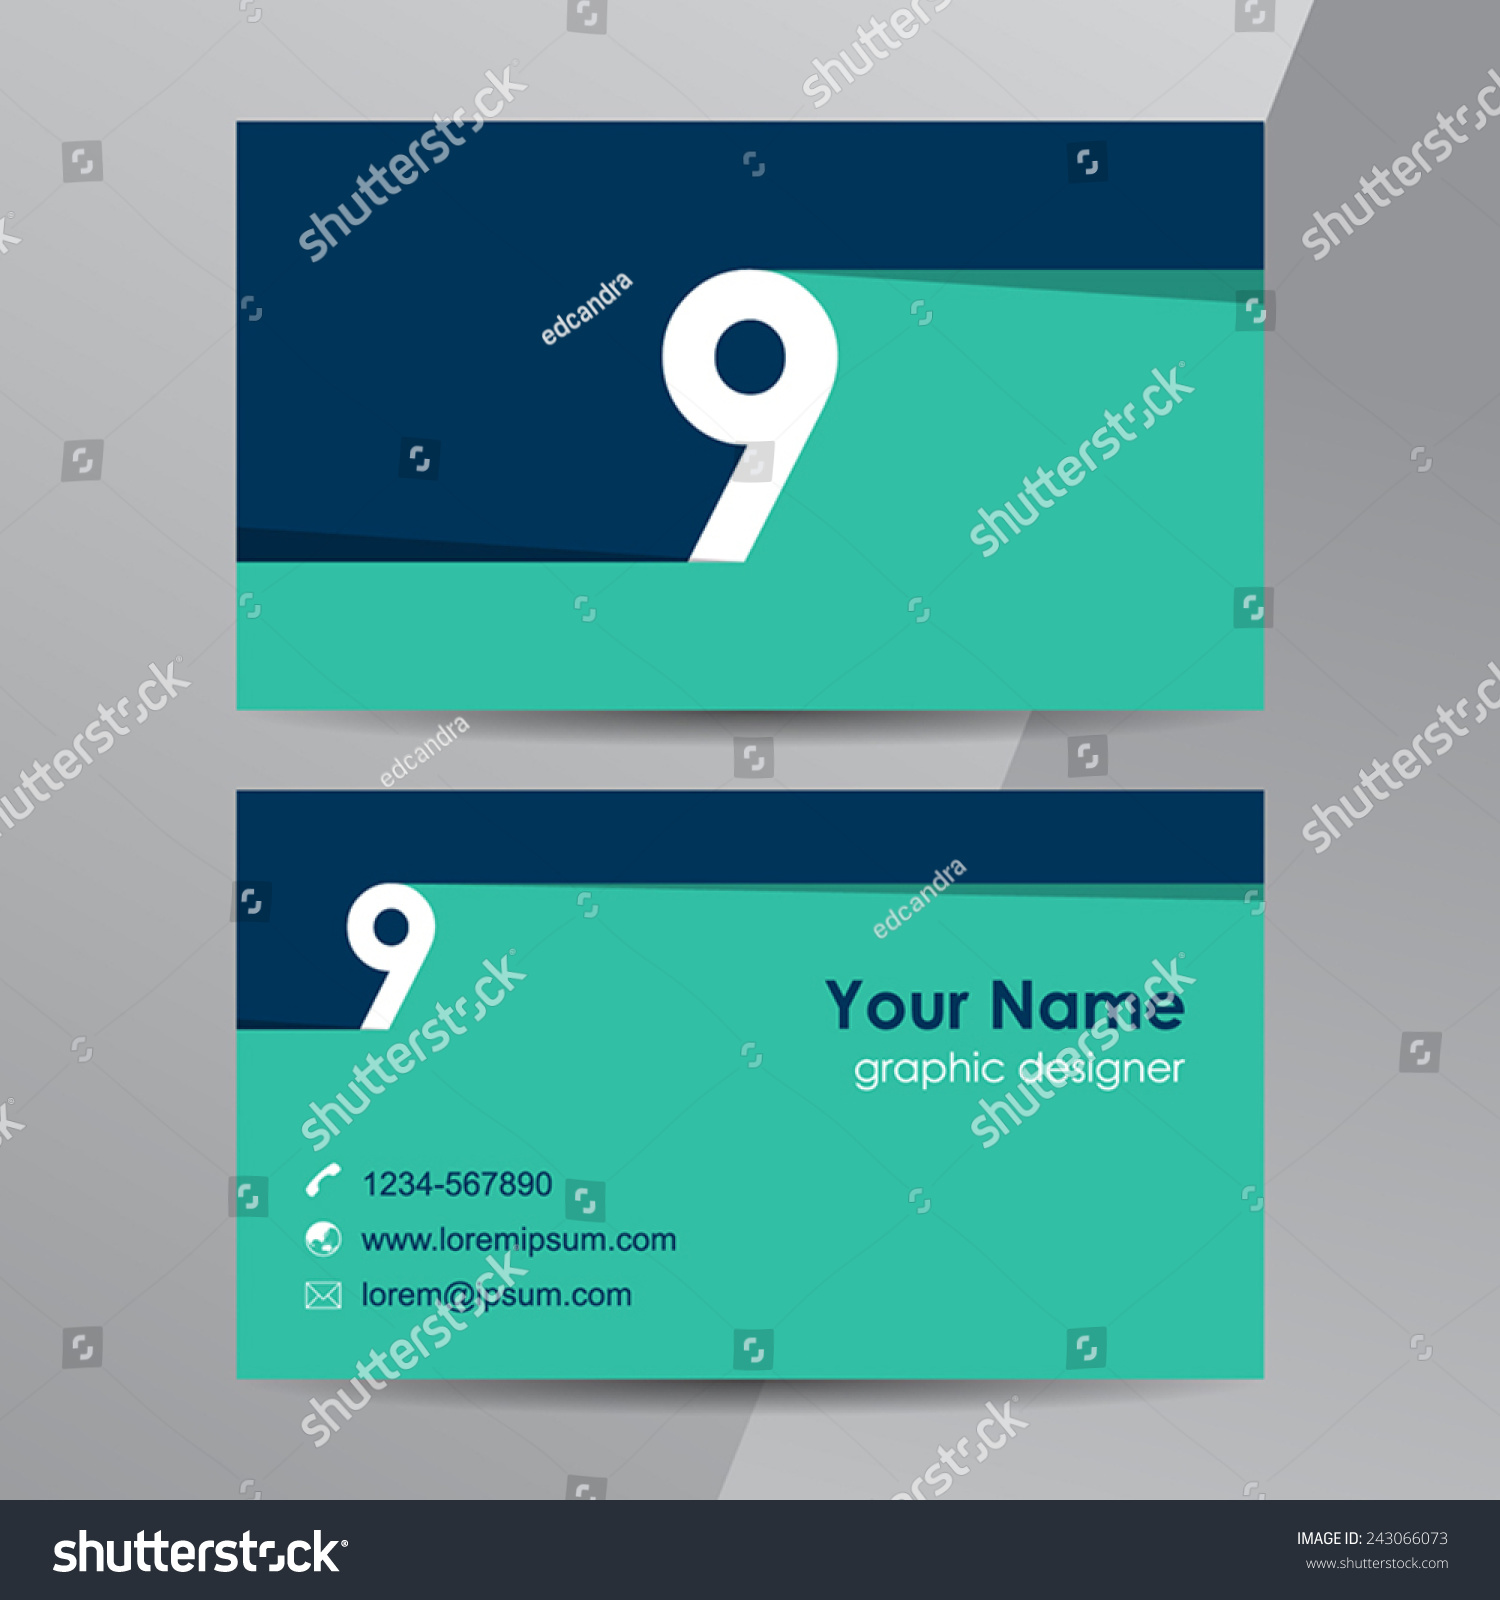 Flat Design Business Cards Template